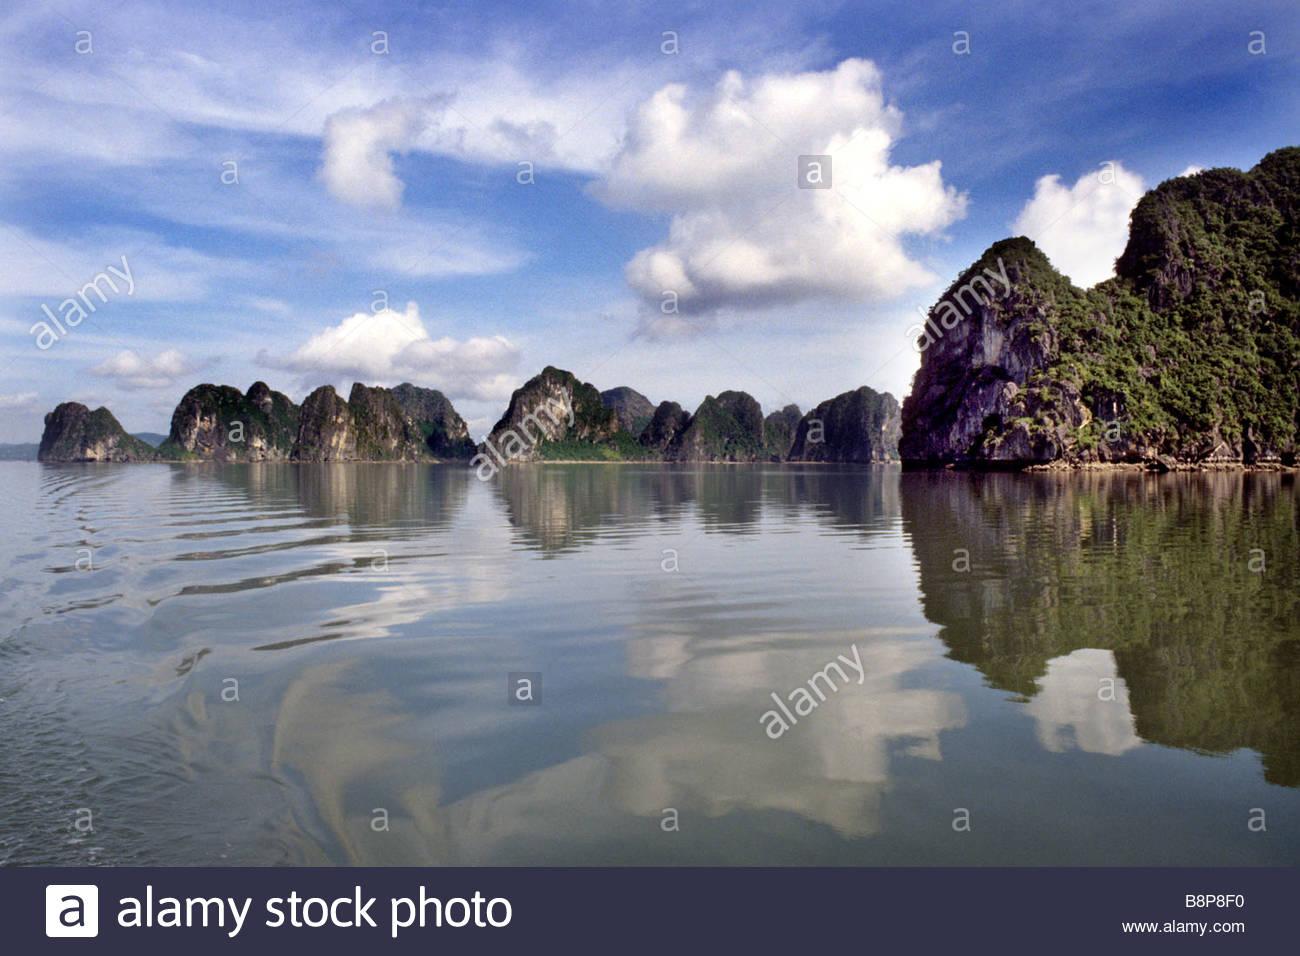 La bahía de Halong, Vietnam, sudeste de asia Imagen De Stock